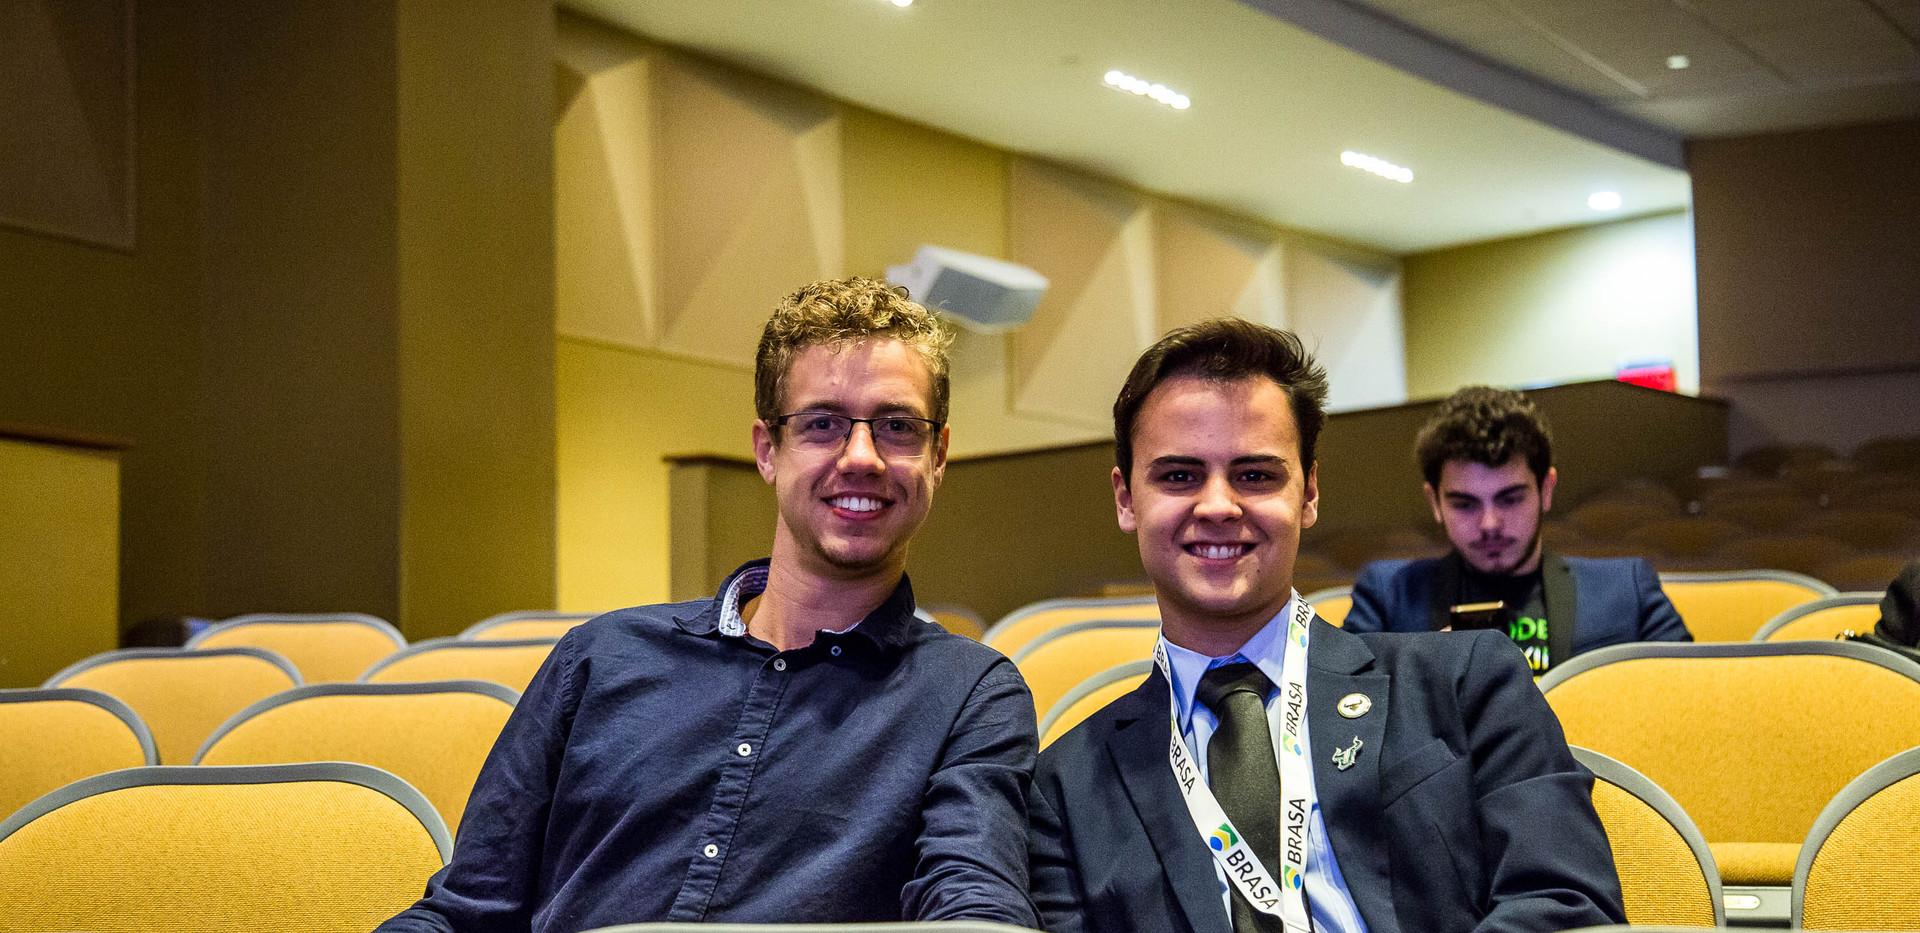 Brazil-FloridaStudentConference-87.jpg